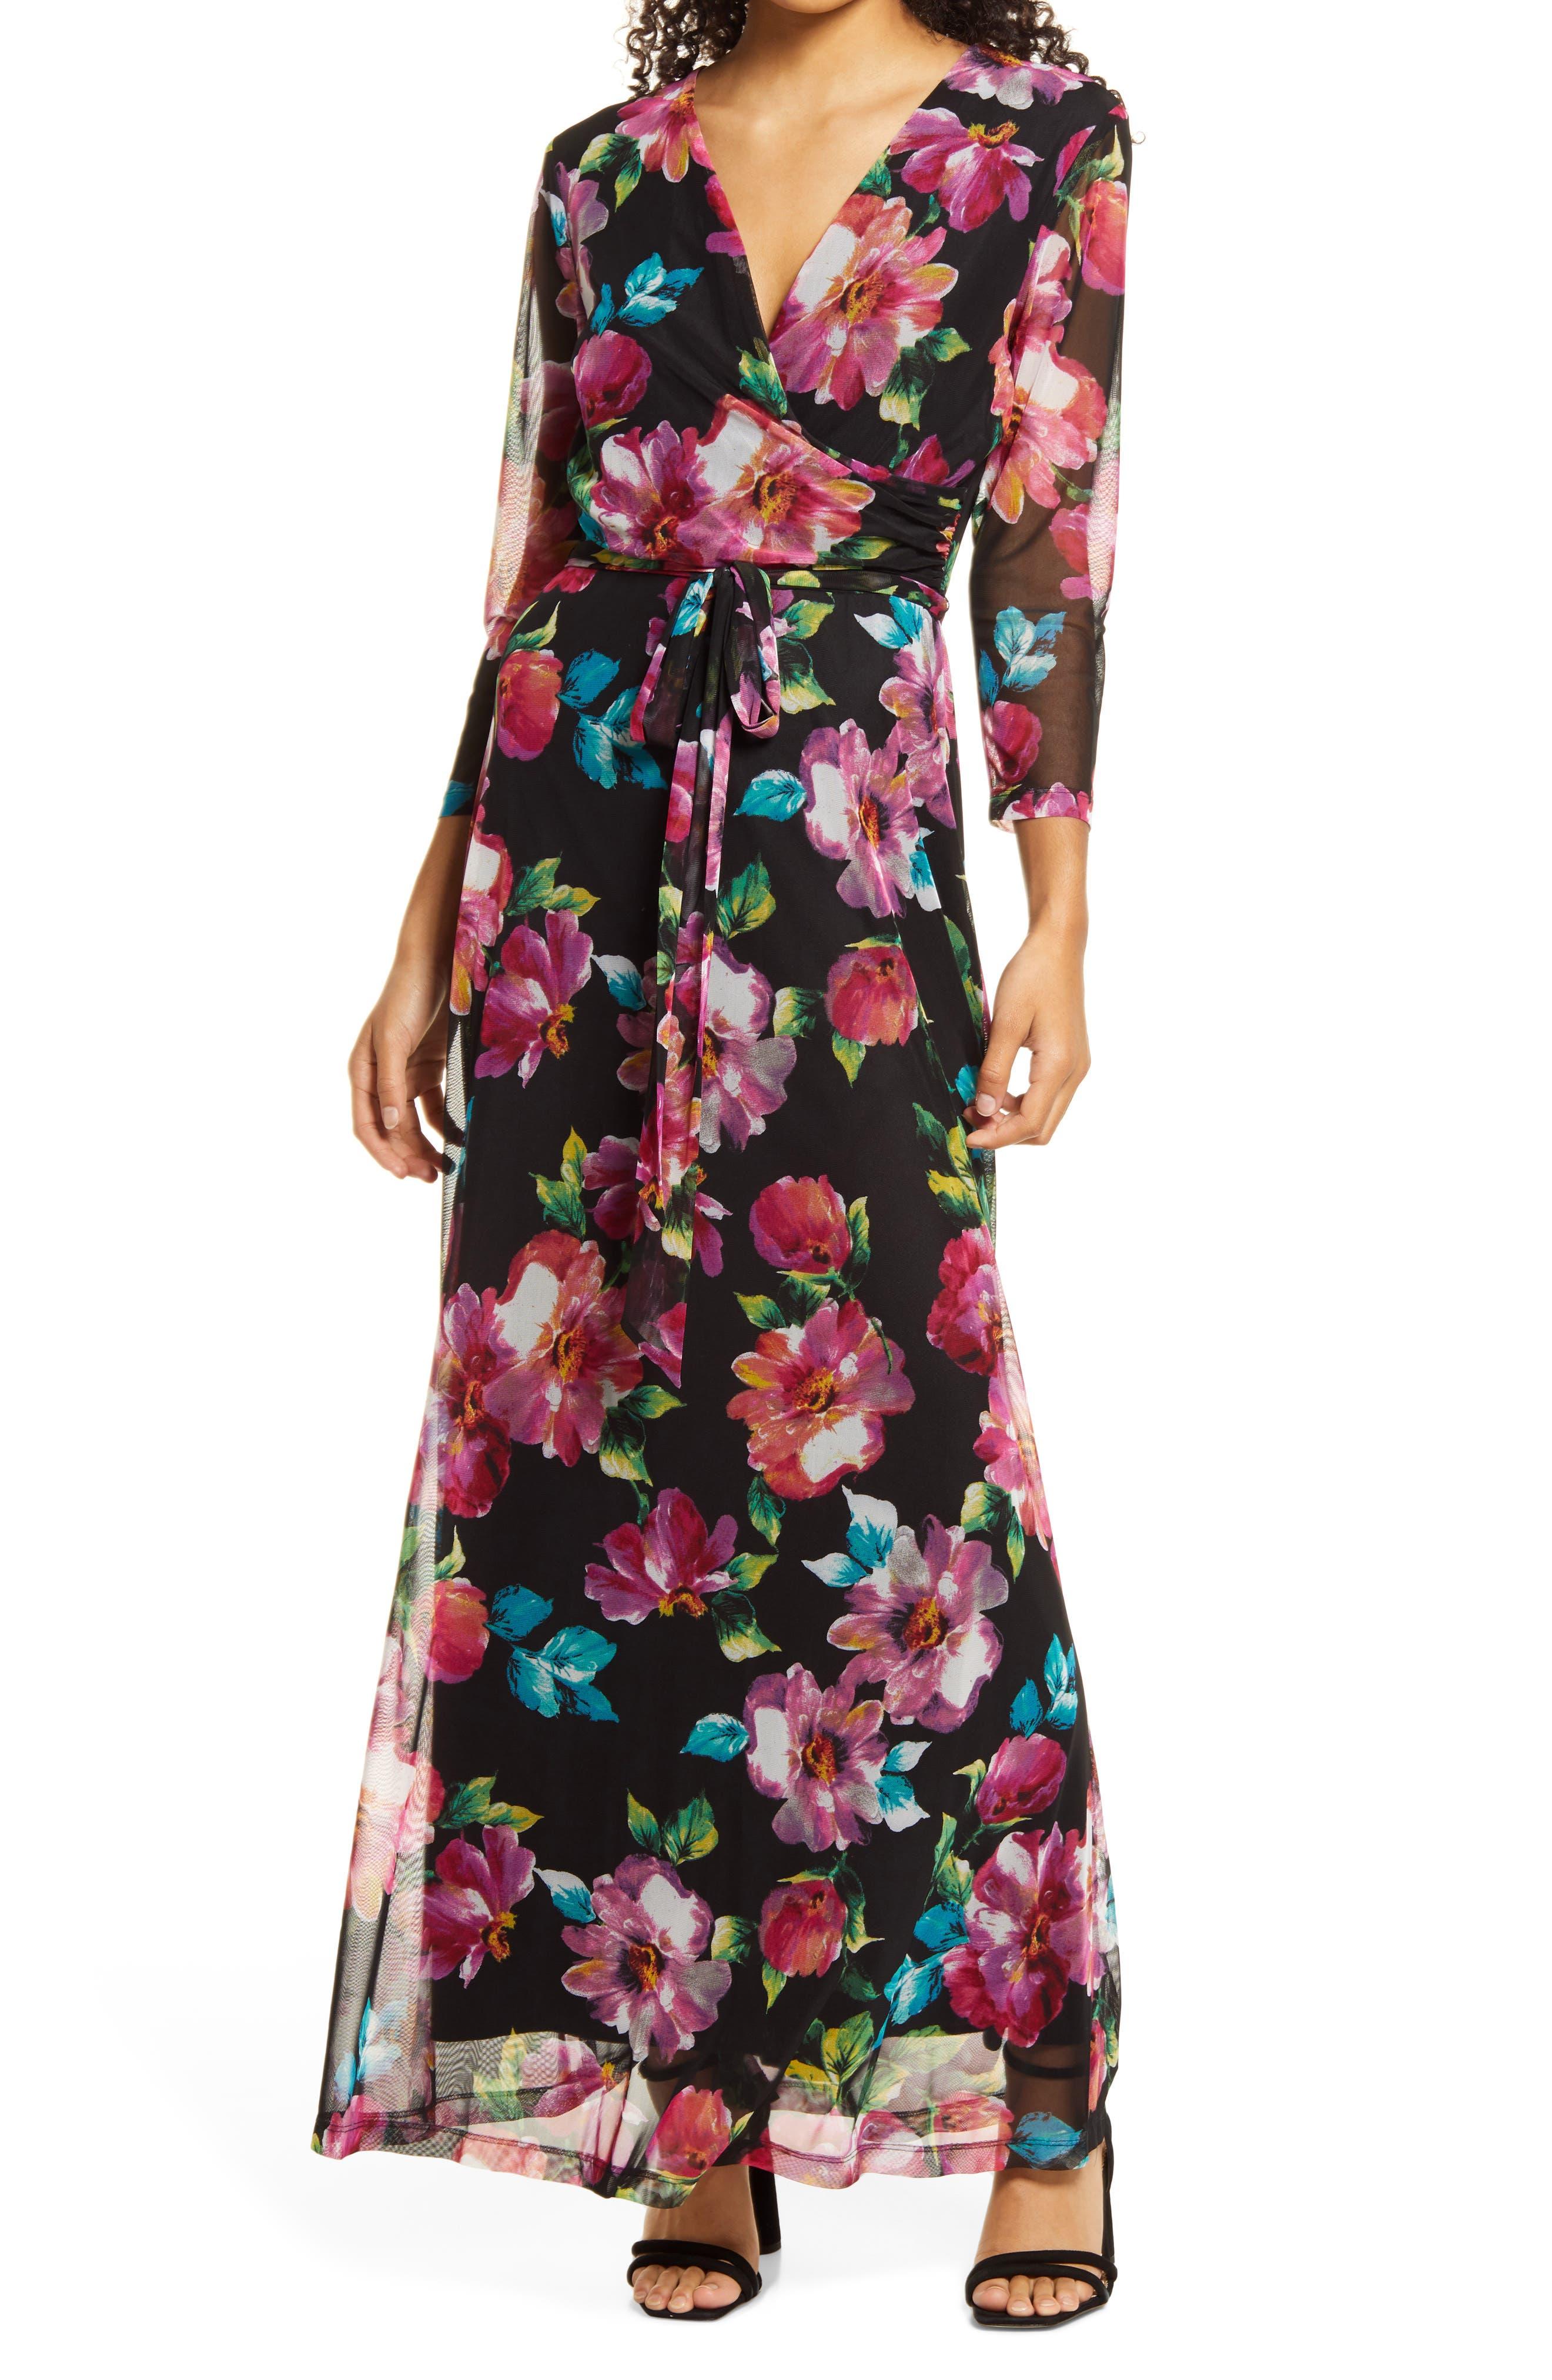 Floral Long Sleeve Waist Tie Dress